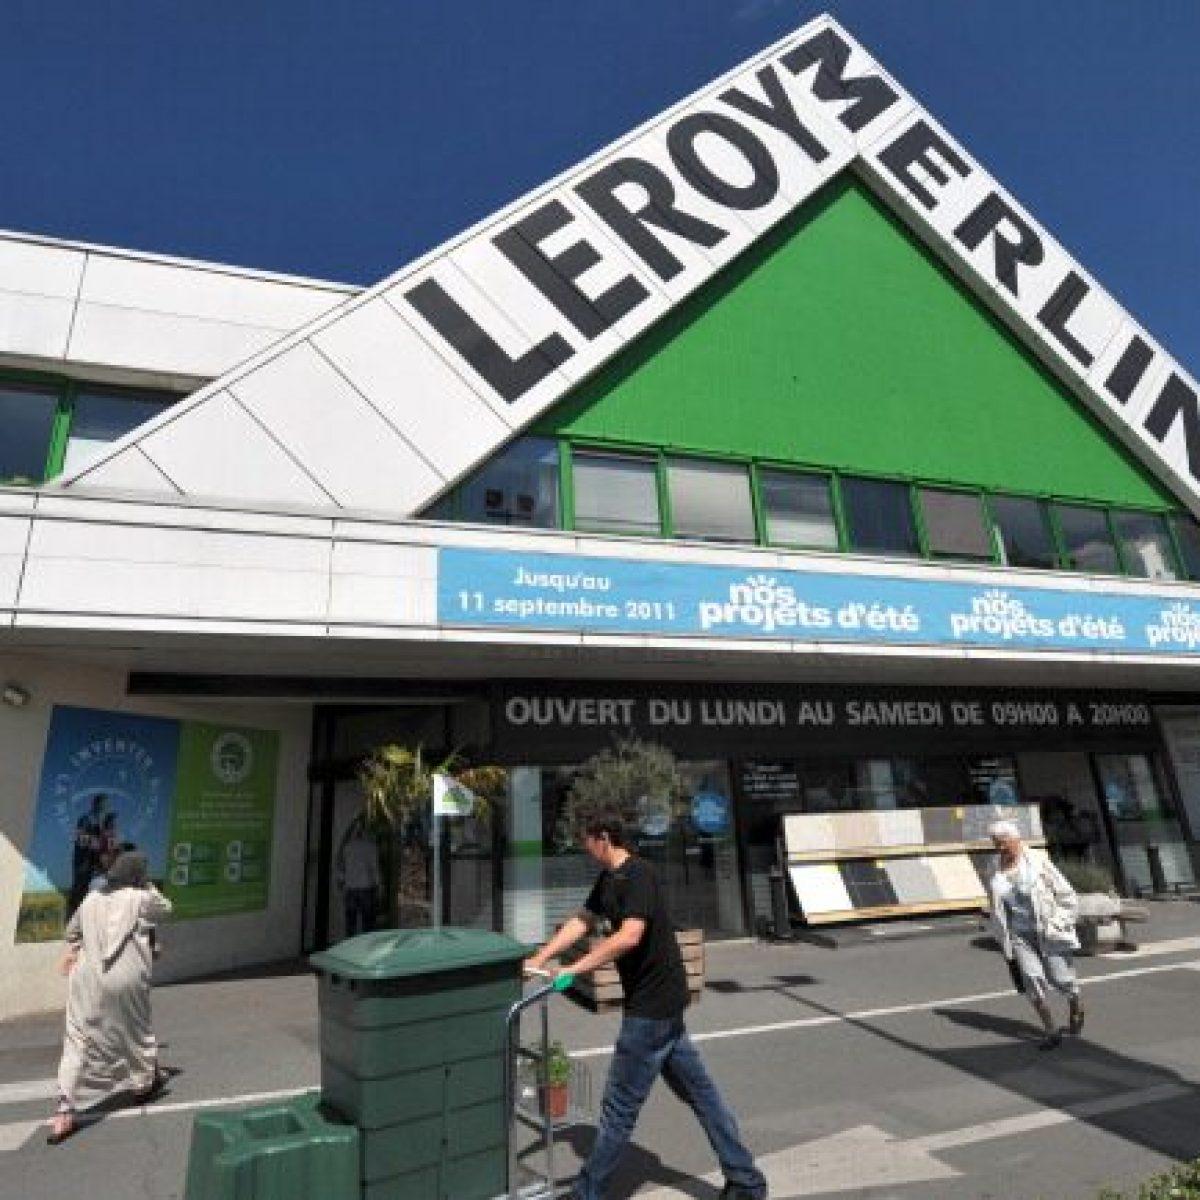 Leroy Merlin Napoli Mobili Bagno.Leroy Merlin Assume Le Posizioni Aperte E Come Candidarsi